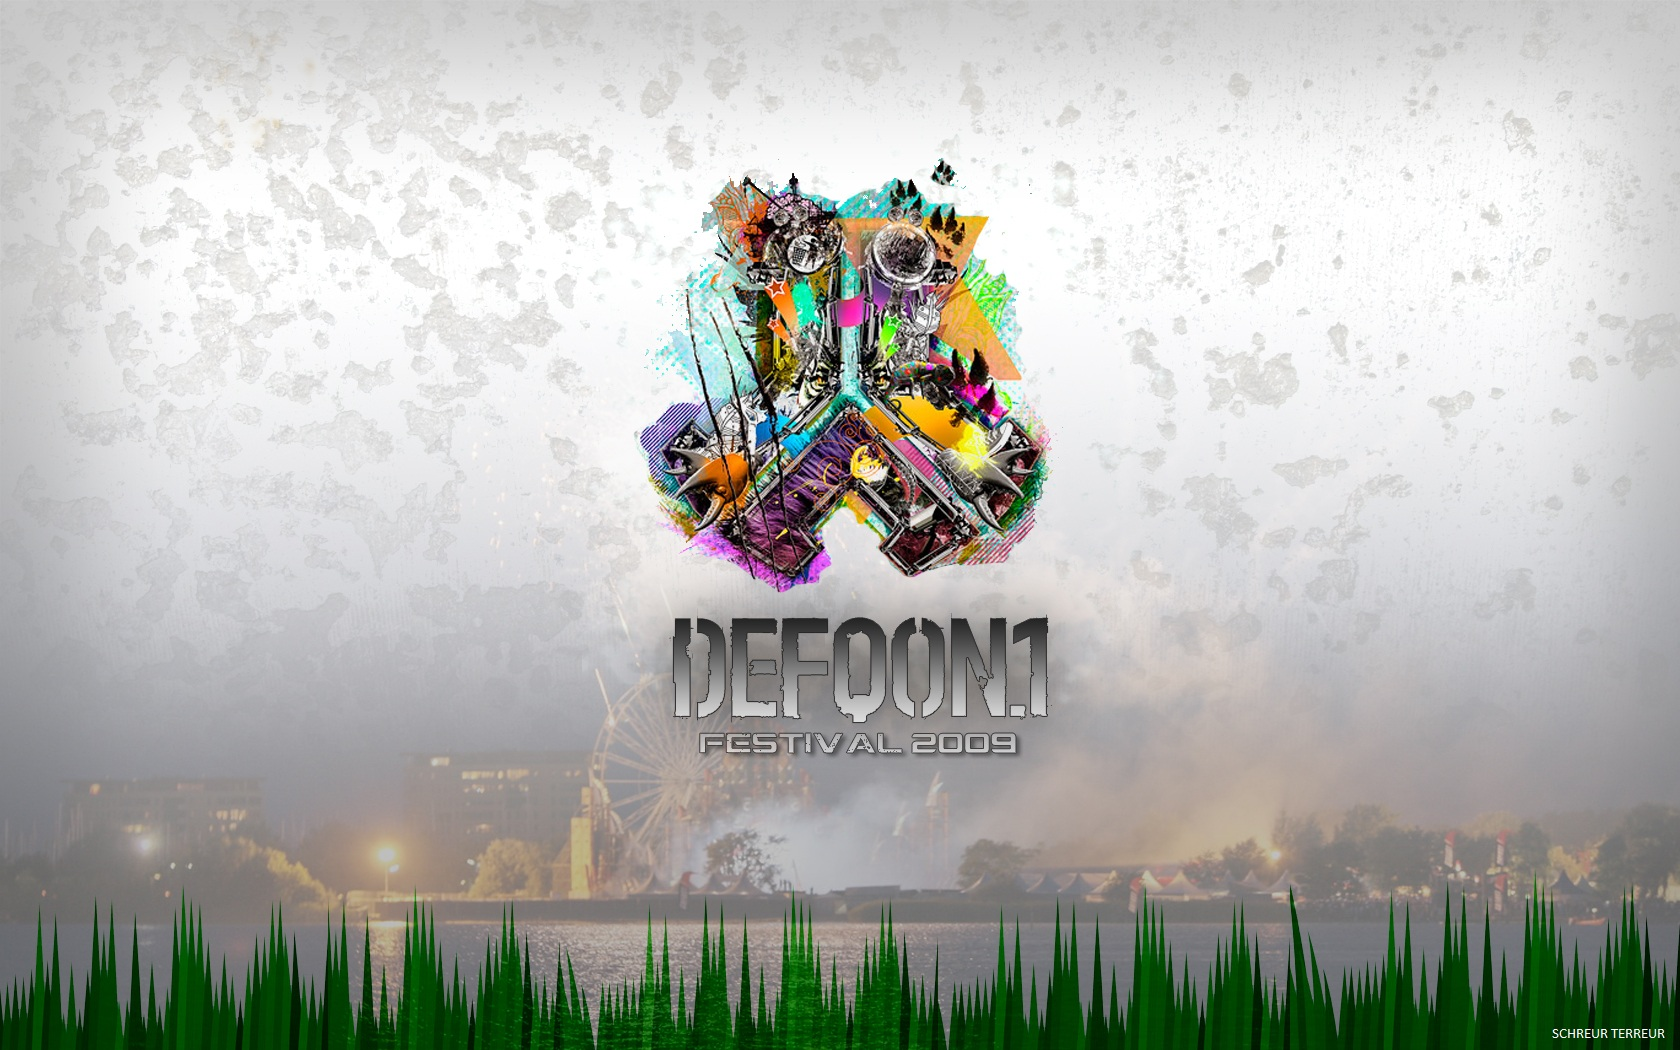 Defqon1 Wallpaper 2009 by Schreur 1680x1050